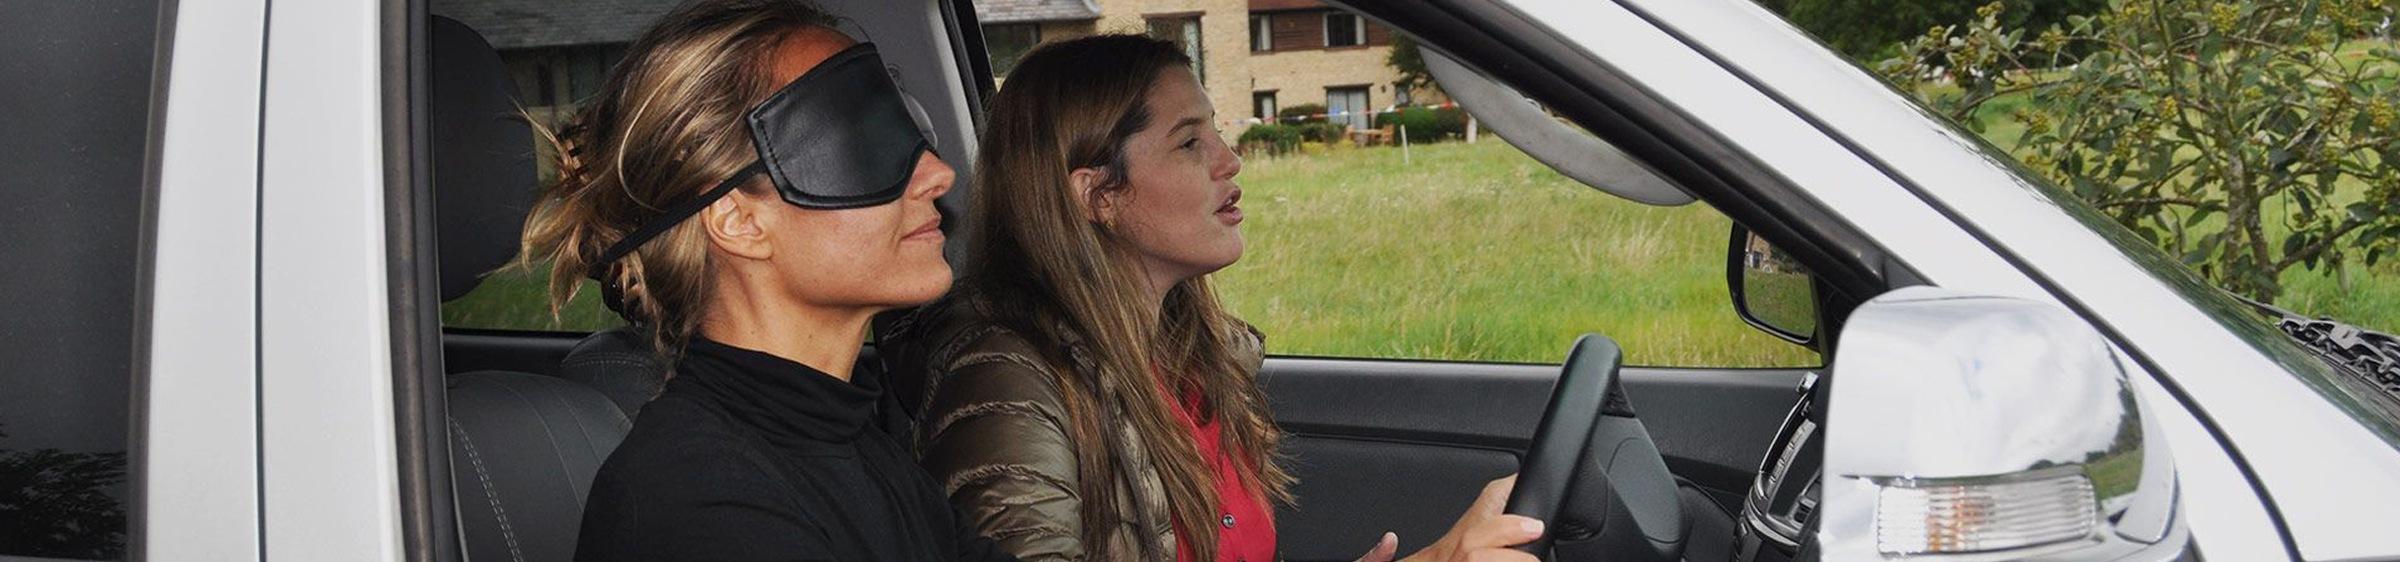 Two women in car driving